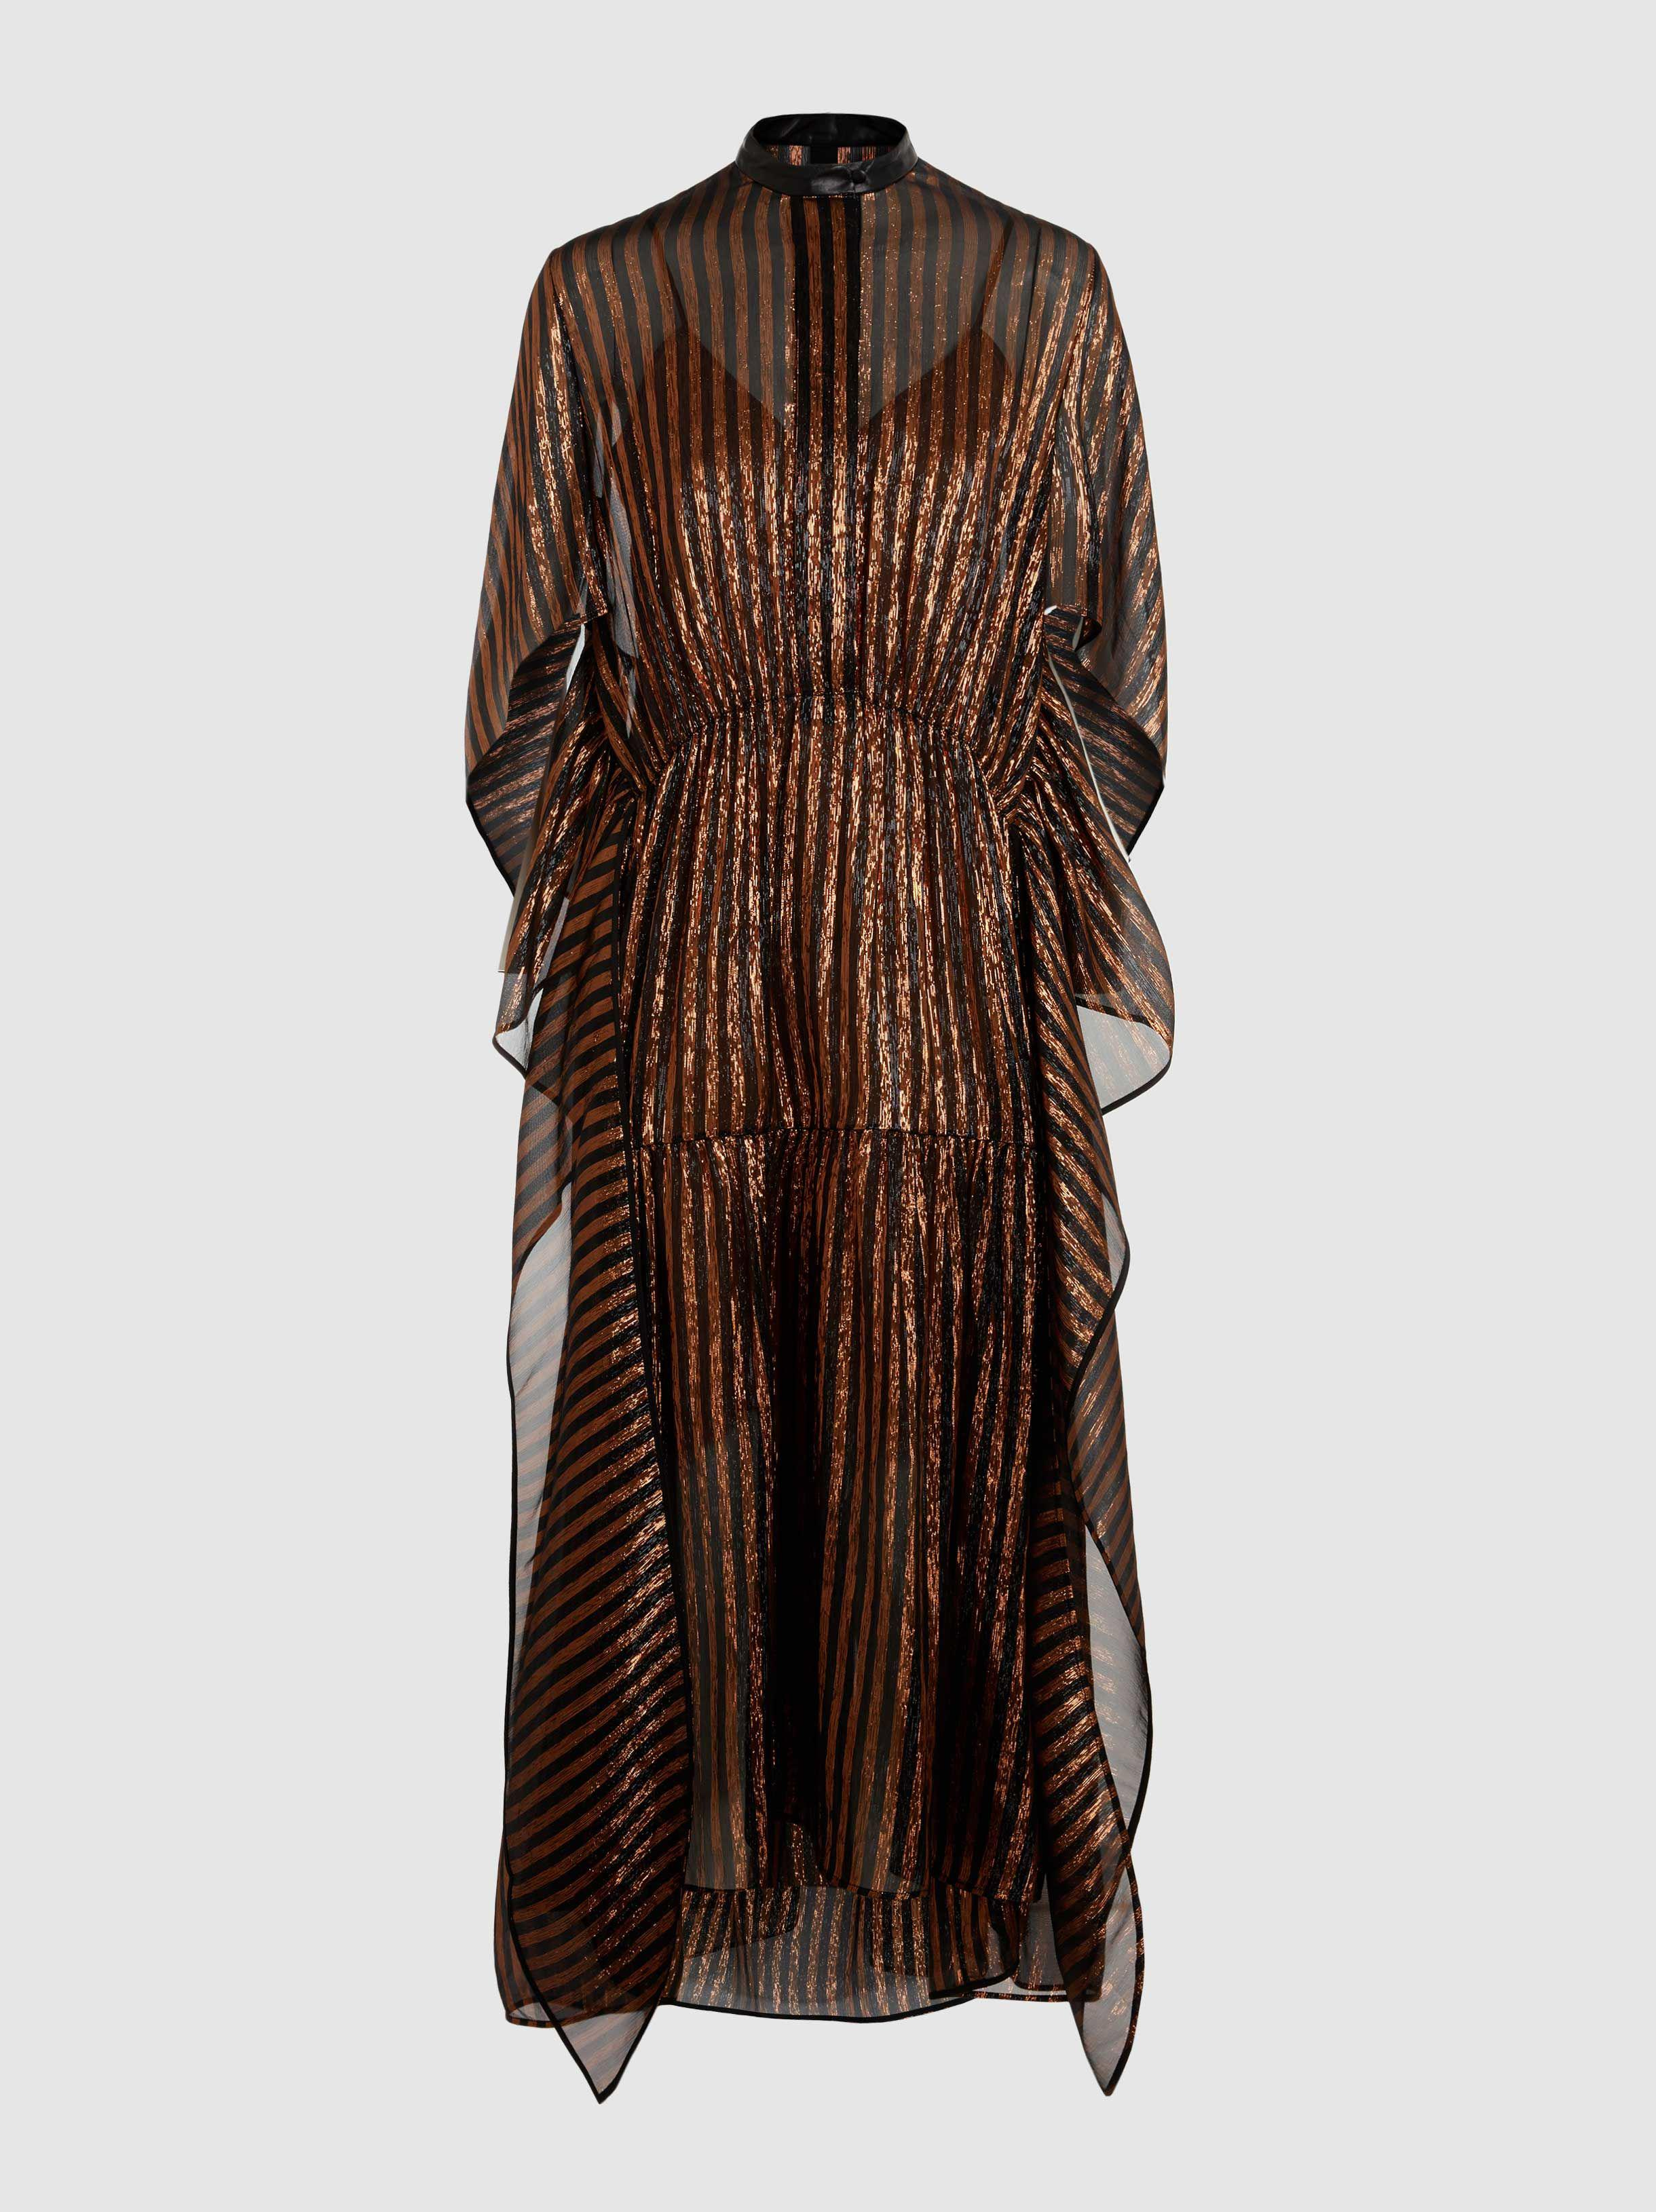 Dellan Long Sleeve Midi Dress Petar Petrov Cheap Online Shop Sale Collections Cheap High Quality Clearance Enjoy Cheap Amazon YvVw3L